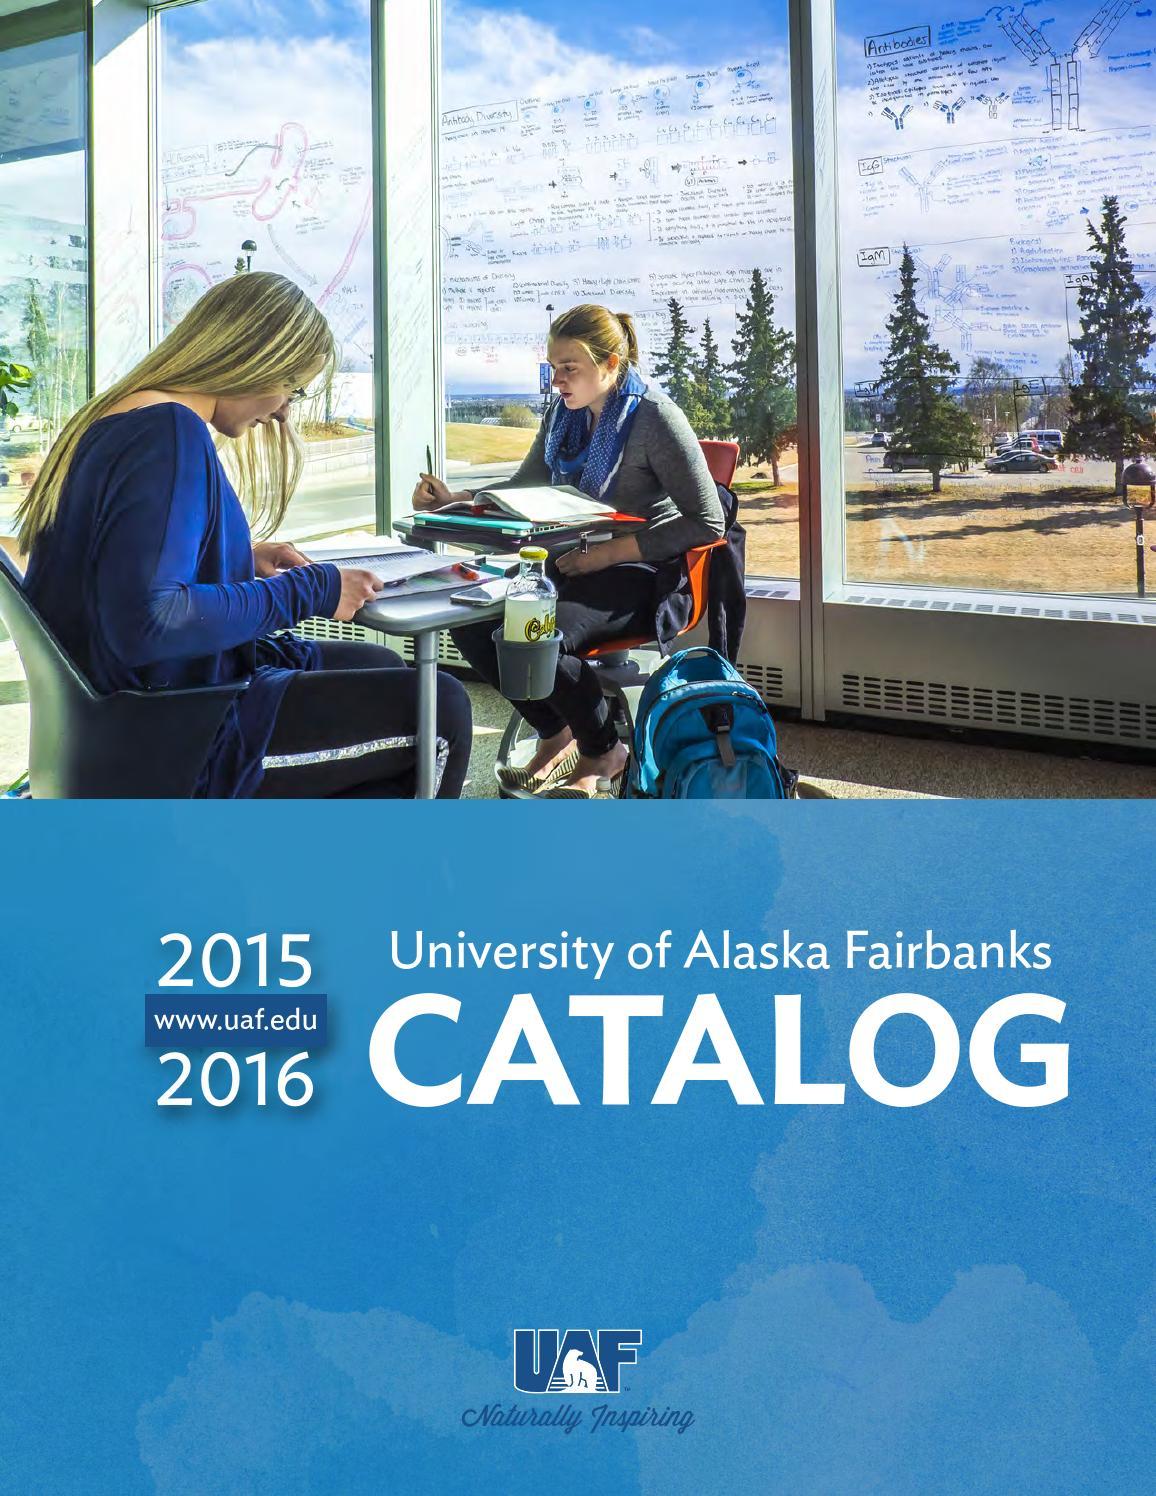 2015 2016 uaf catalog by university of alaska fairbanks issuu. Black Bedroom Furniture Sets. Home Design Ideas